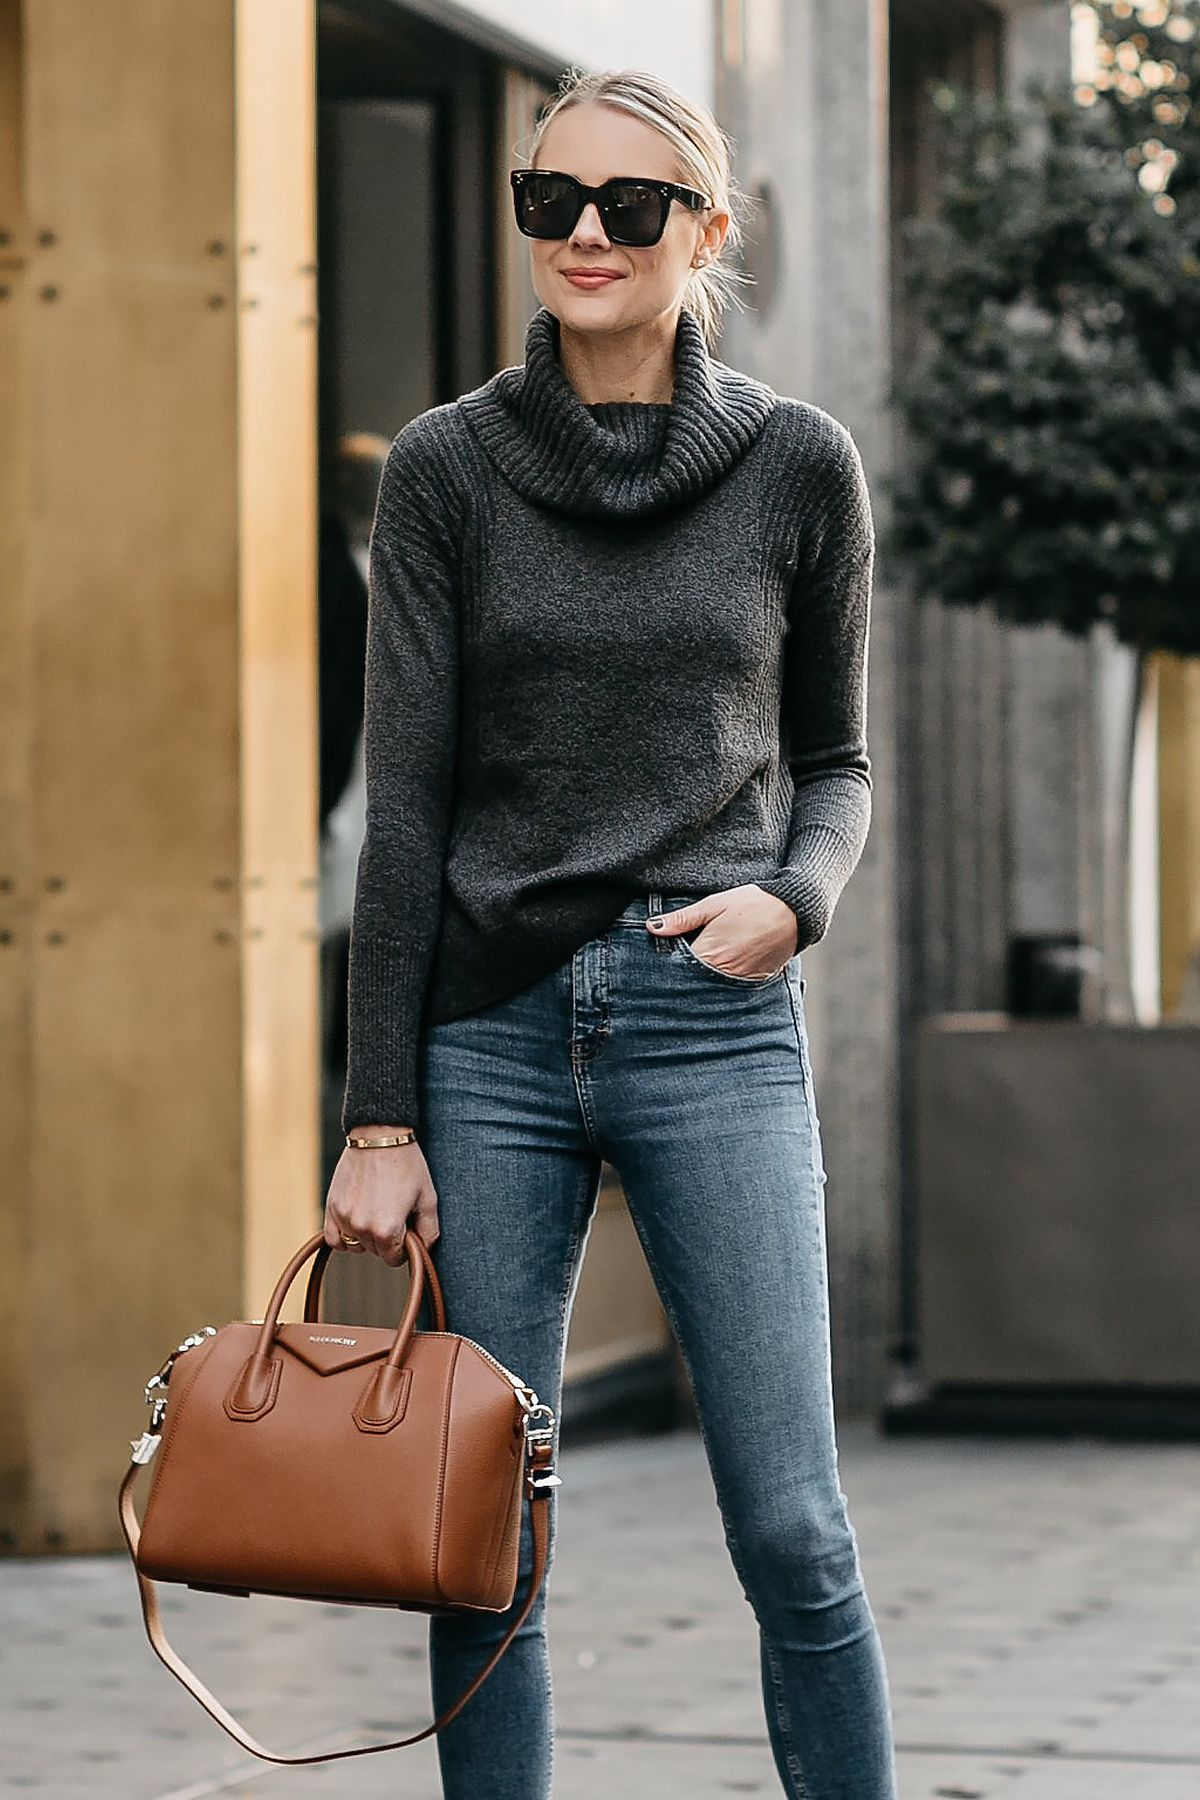 30bbb6afed88 Blonde Woman Wearing Grey Turtleneck Sweater Denim Skinny Jeans Givenchy  Antigona Cognac Handbag Fashion Jackson Dallas Blogger Fashion Blogger  Street Style